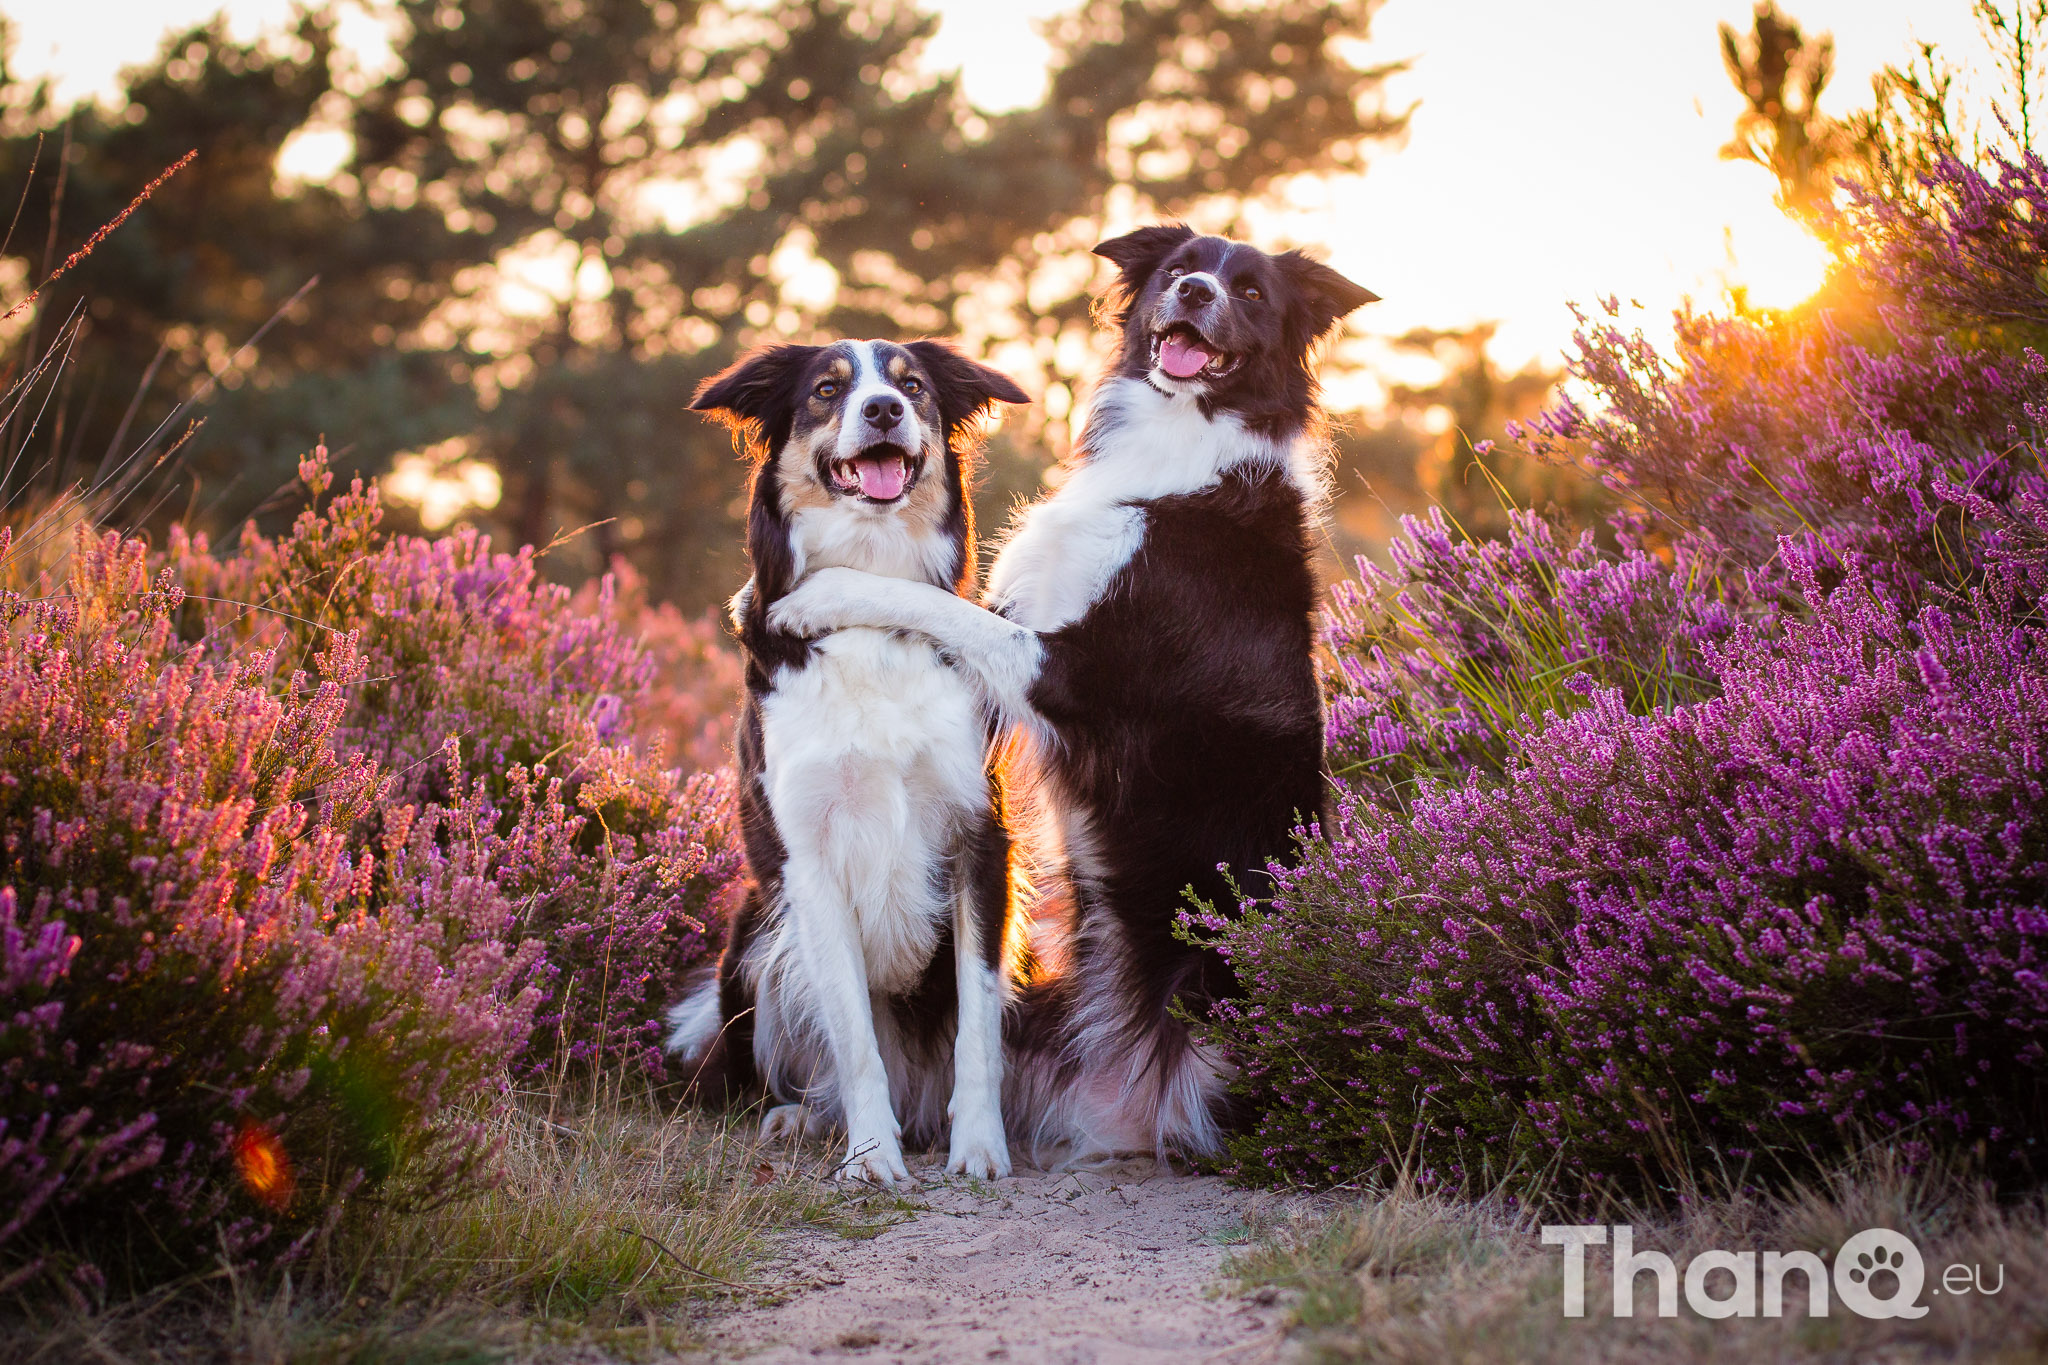 Portfolio hondenfotografie - Fenna knuffelt Jindi tussen de heide